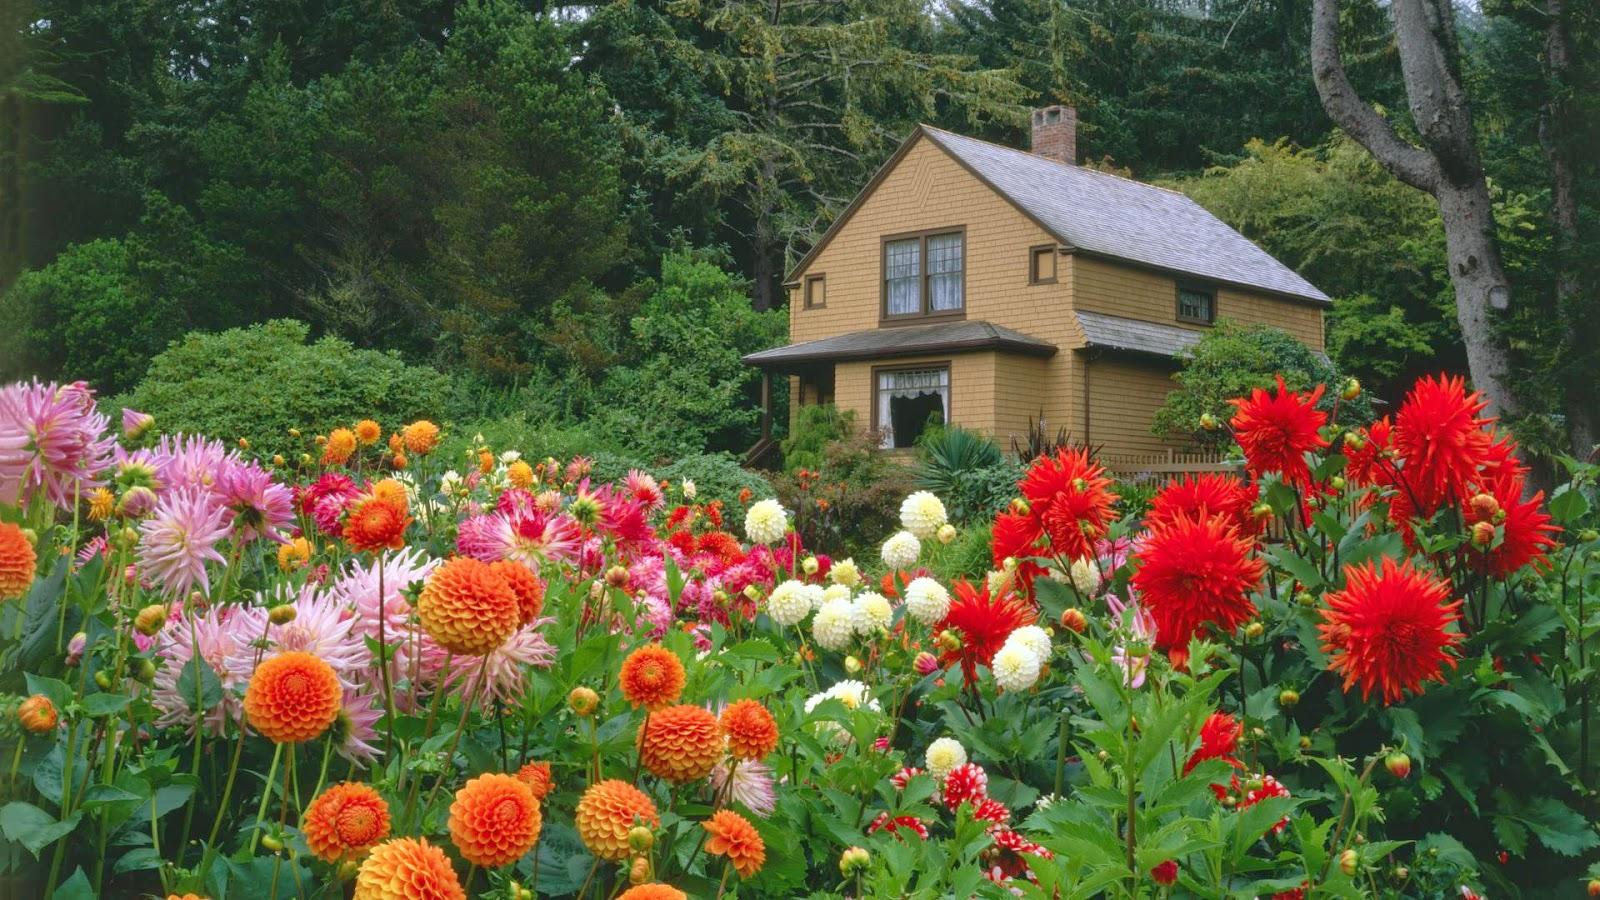 Flower Garden Wallpaper Downloadhttprefreshrose 1600x900